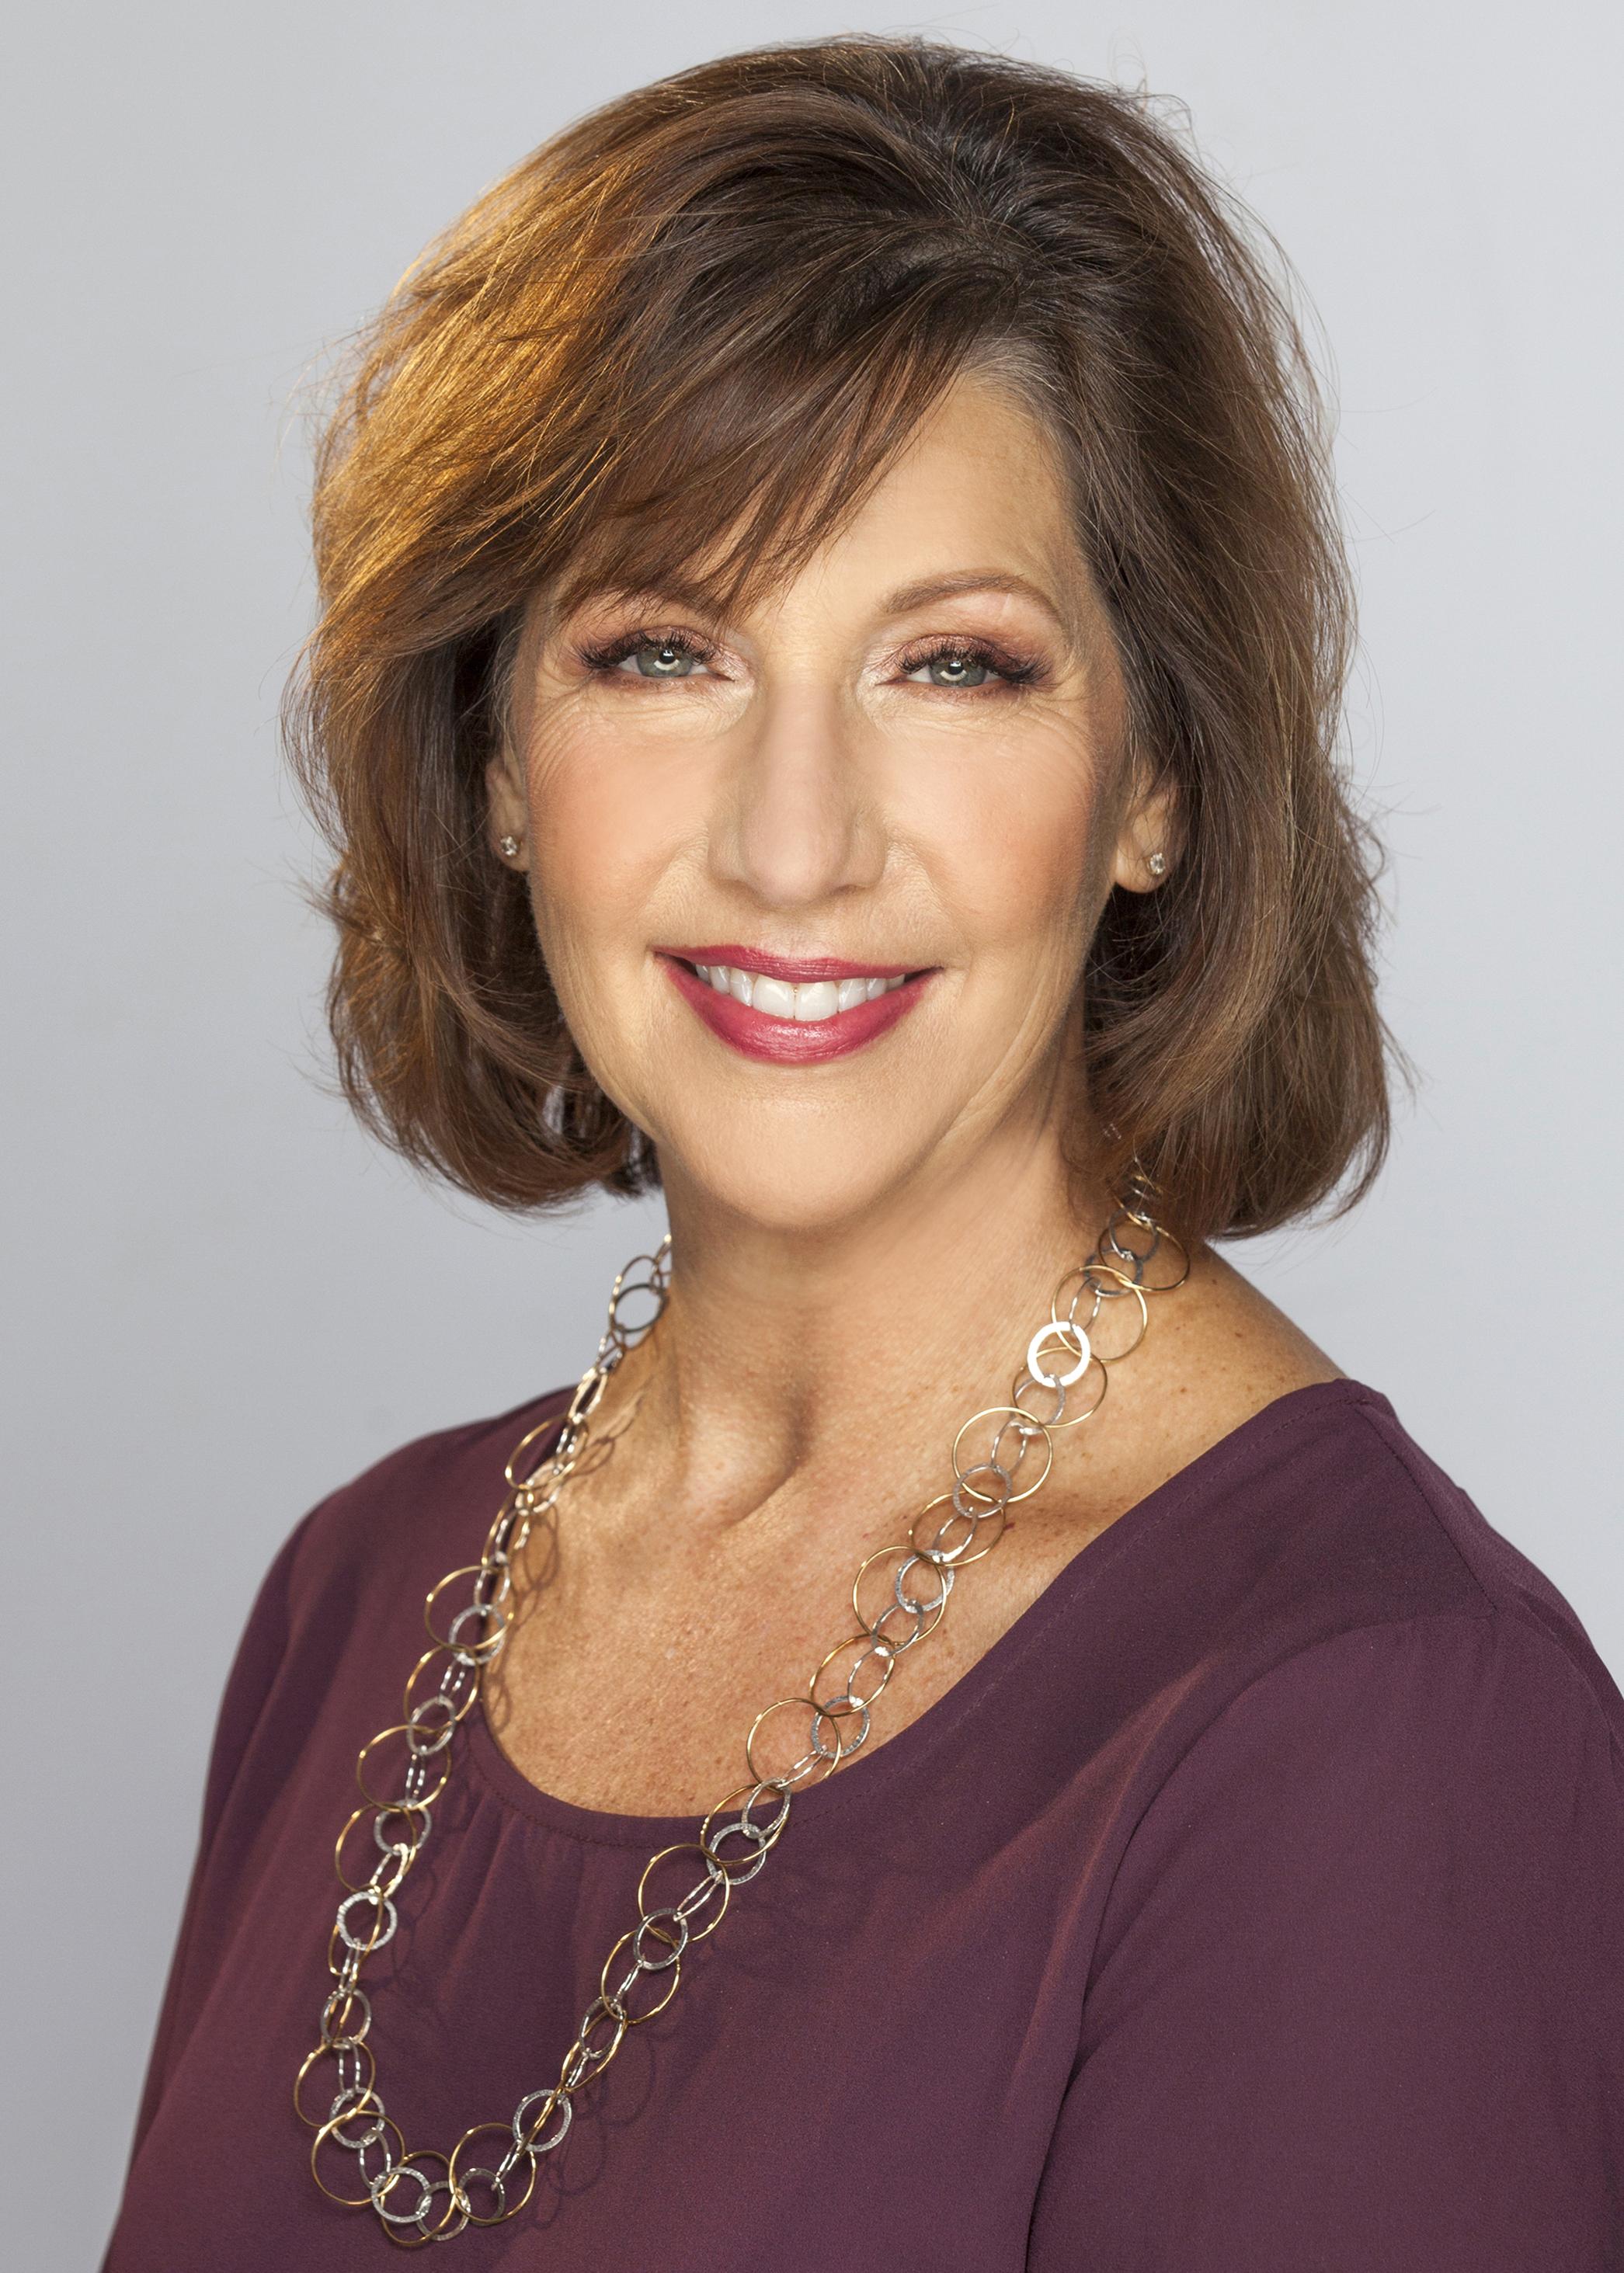 Kathy undefined Hauge